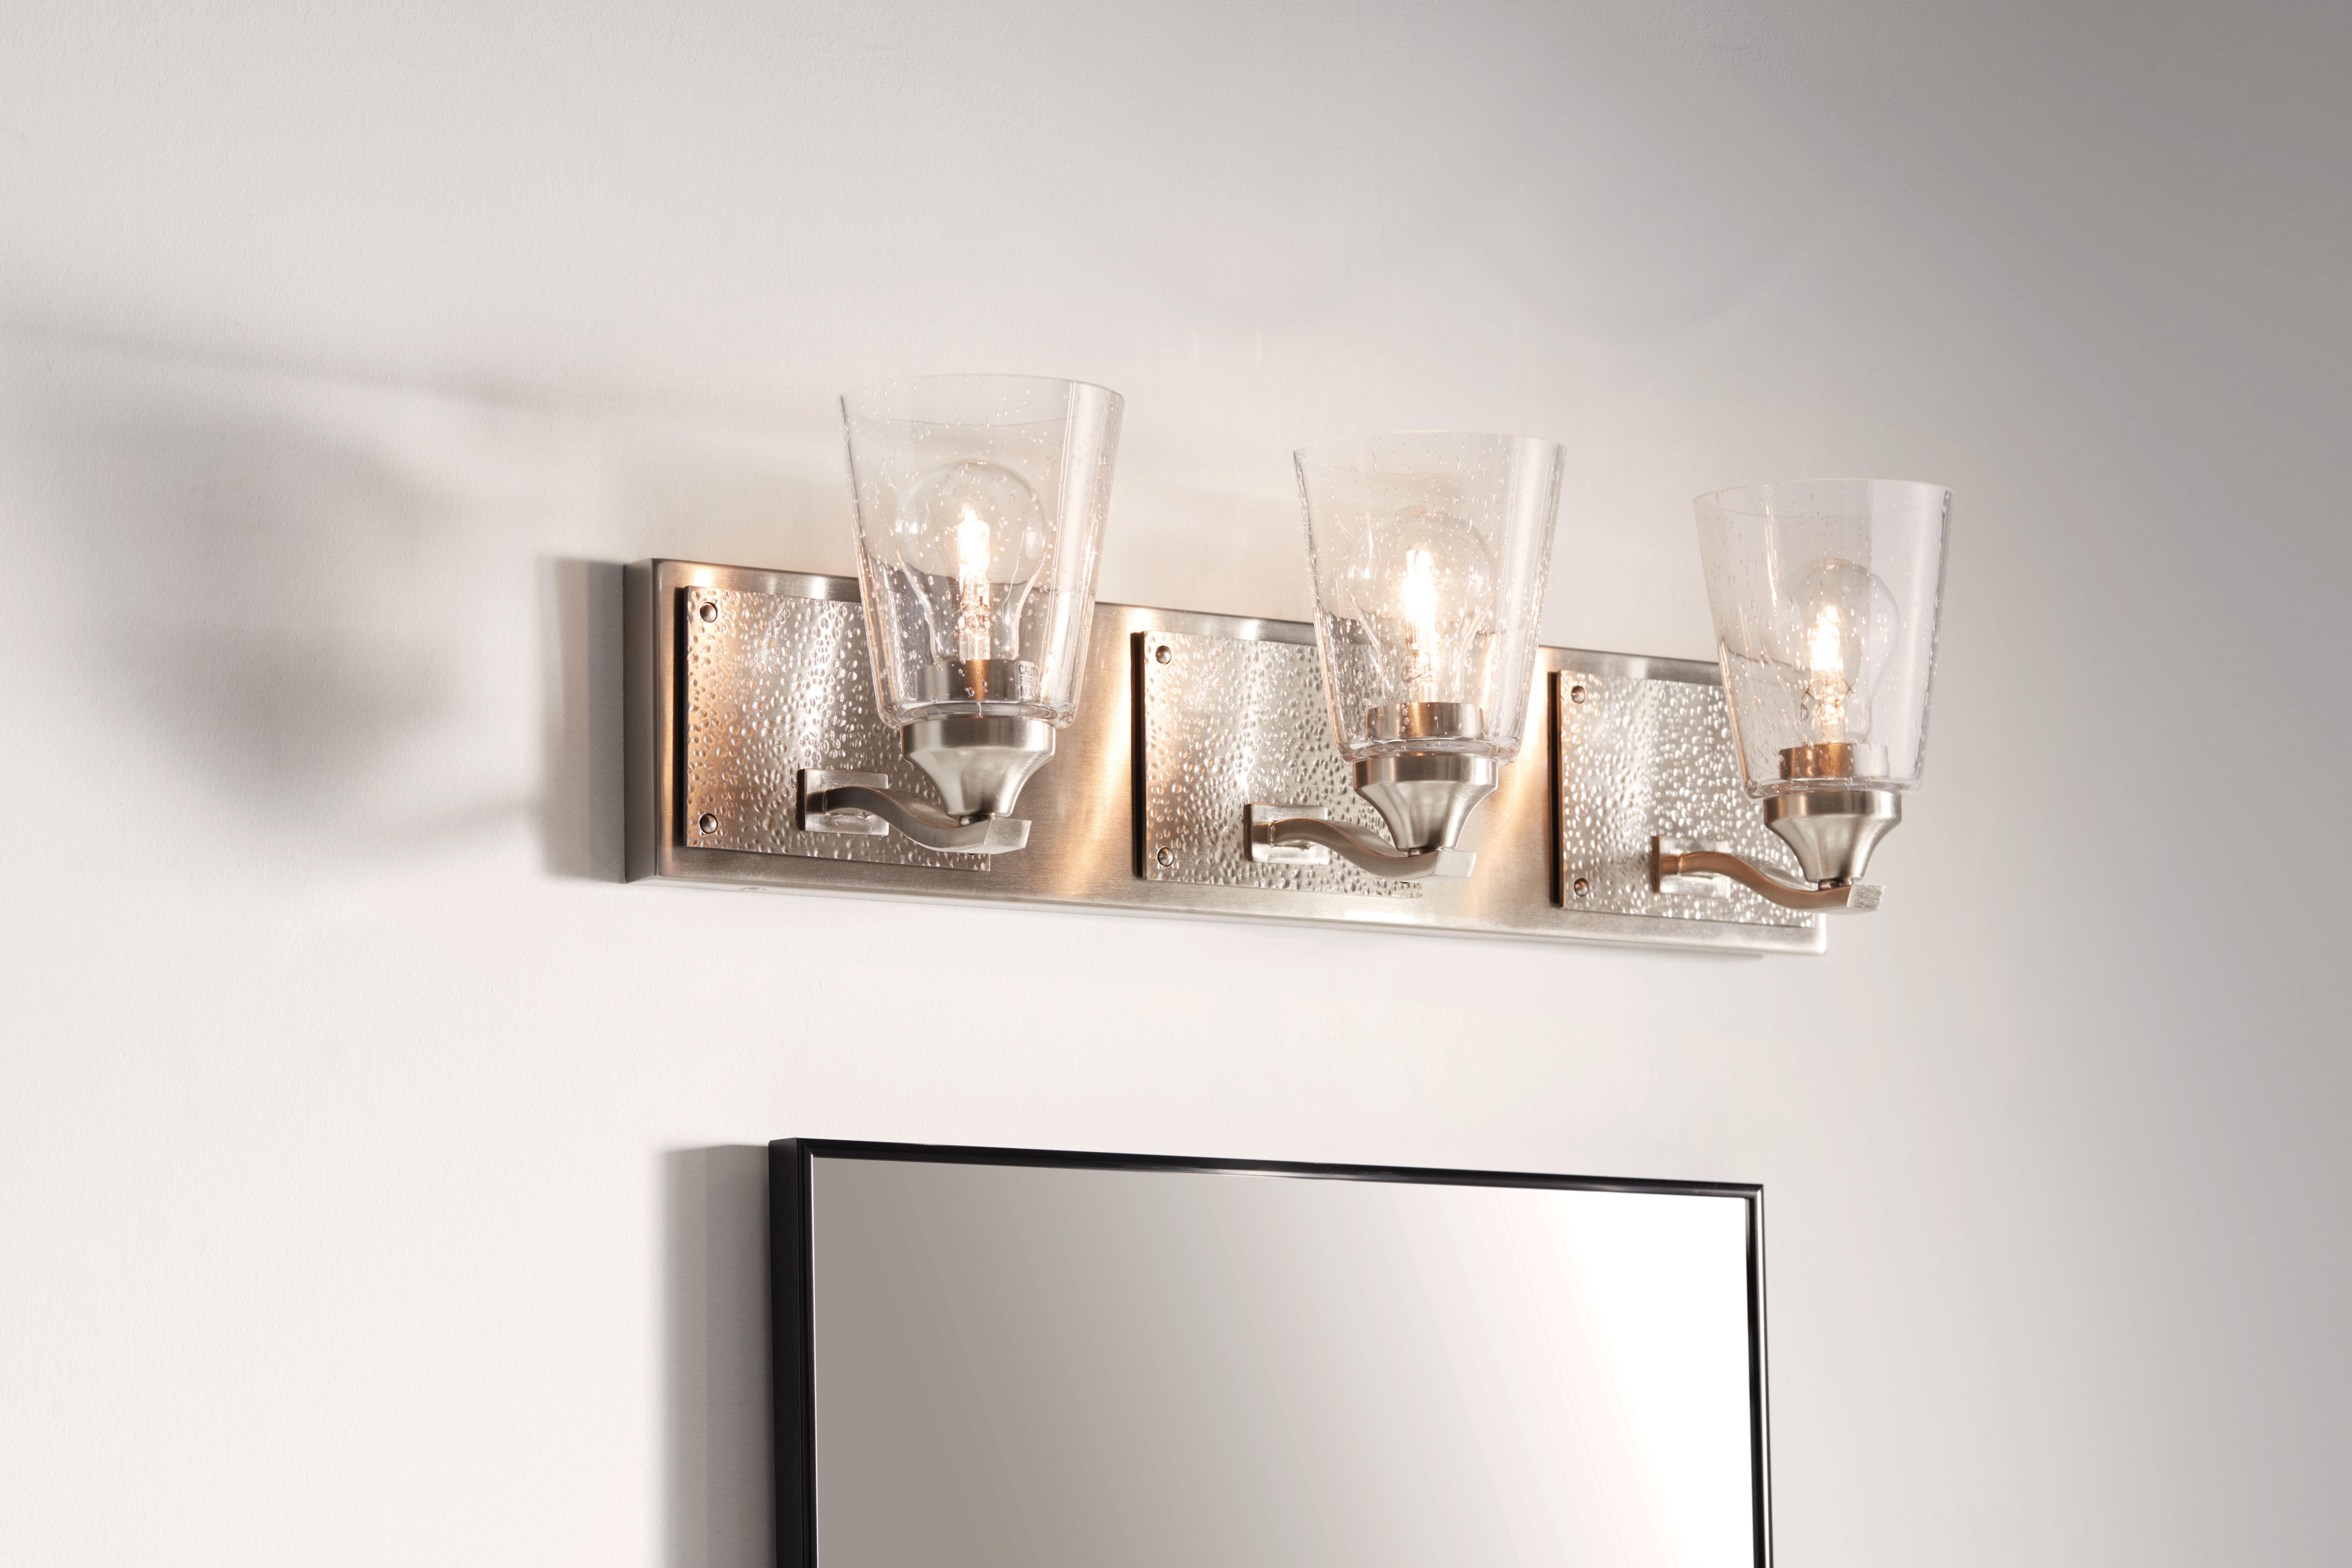 83b63639817 Hinkley Lighting Jackson 3-Light Vanity Light   Reviews